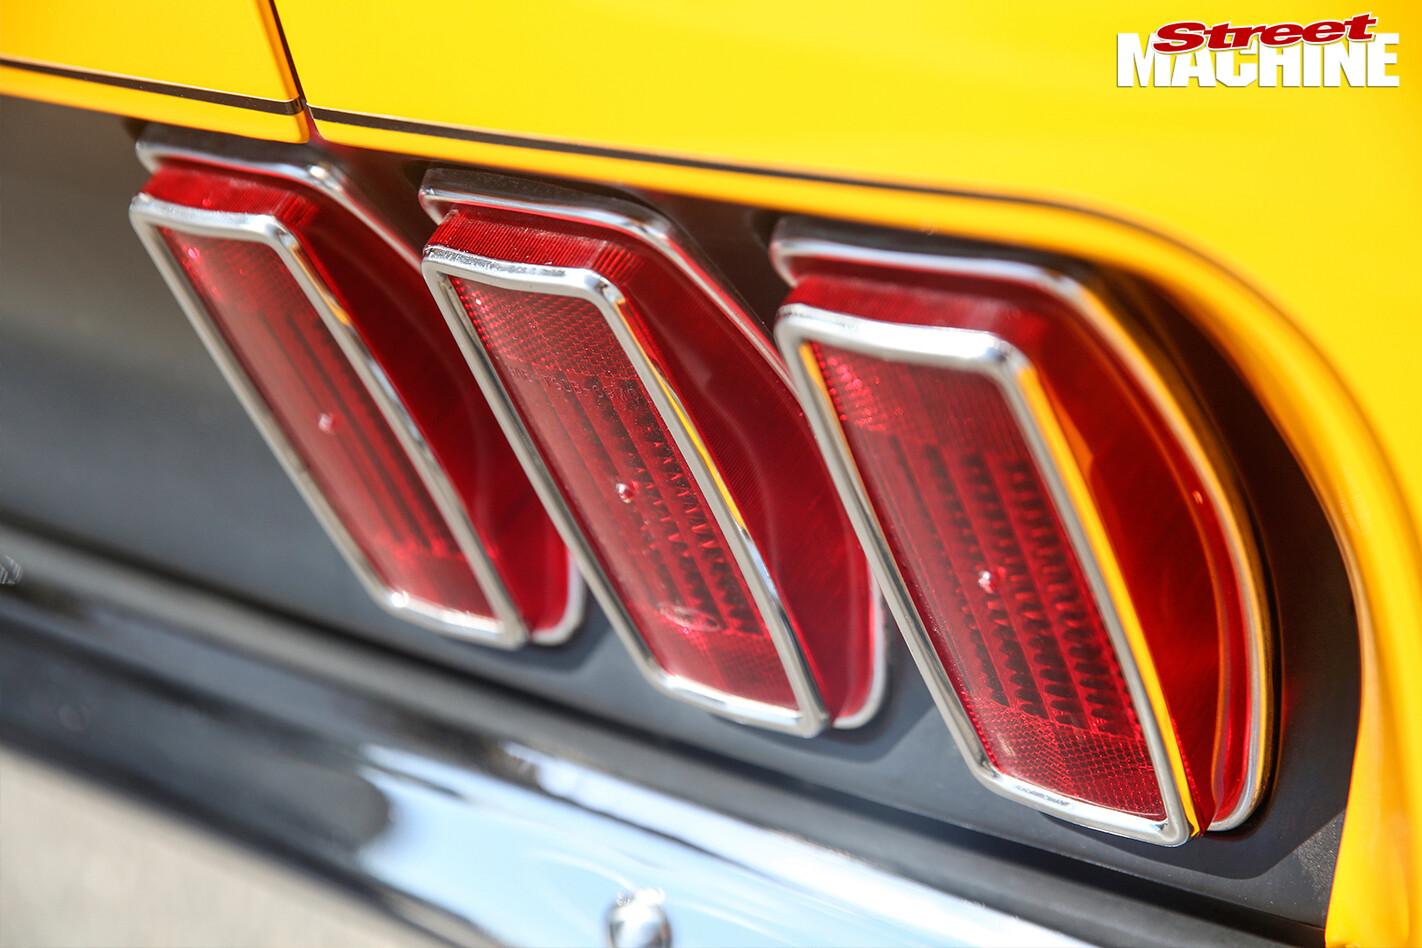 Ford -Mustang -BOSS-rear -taillights